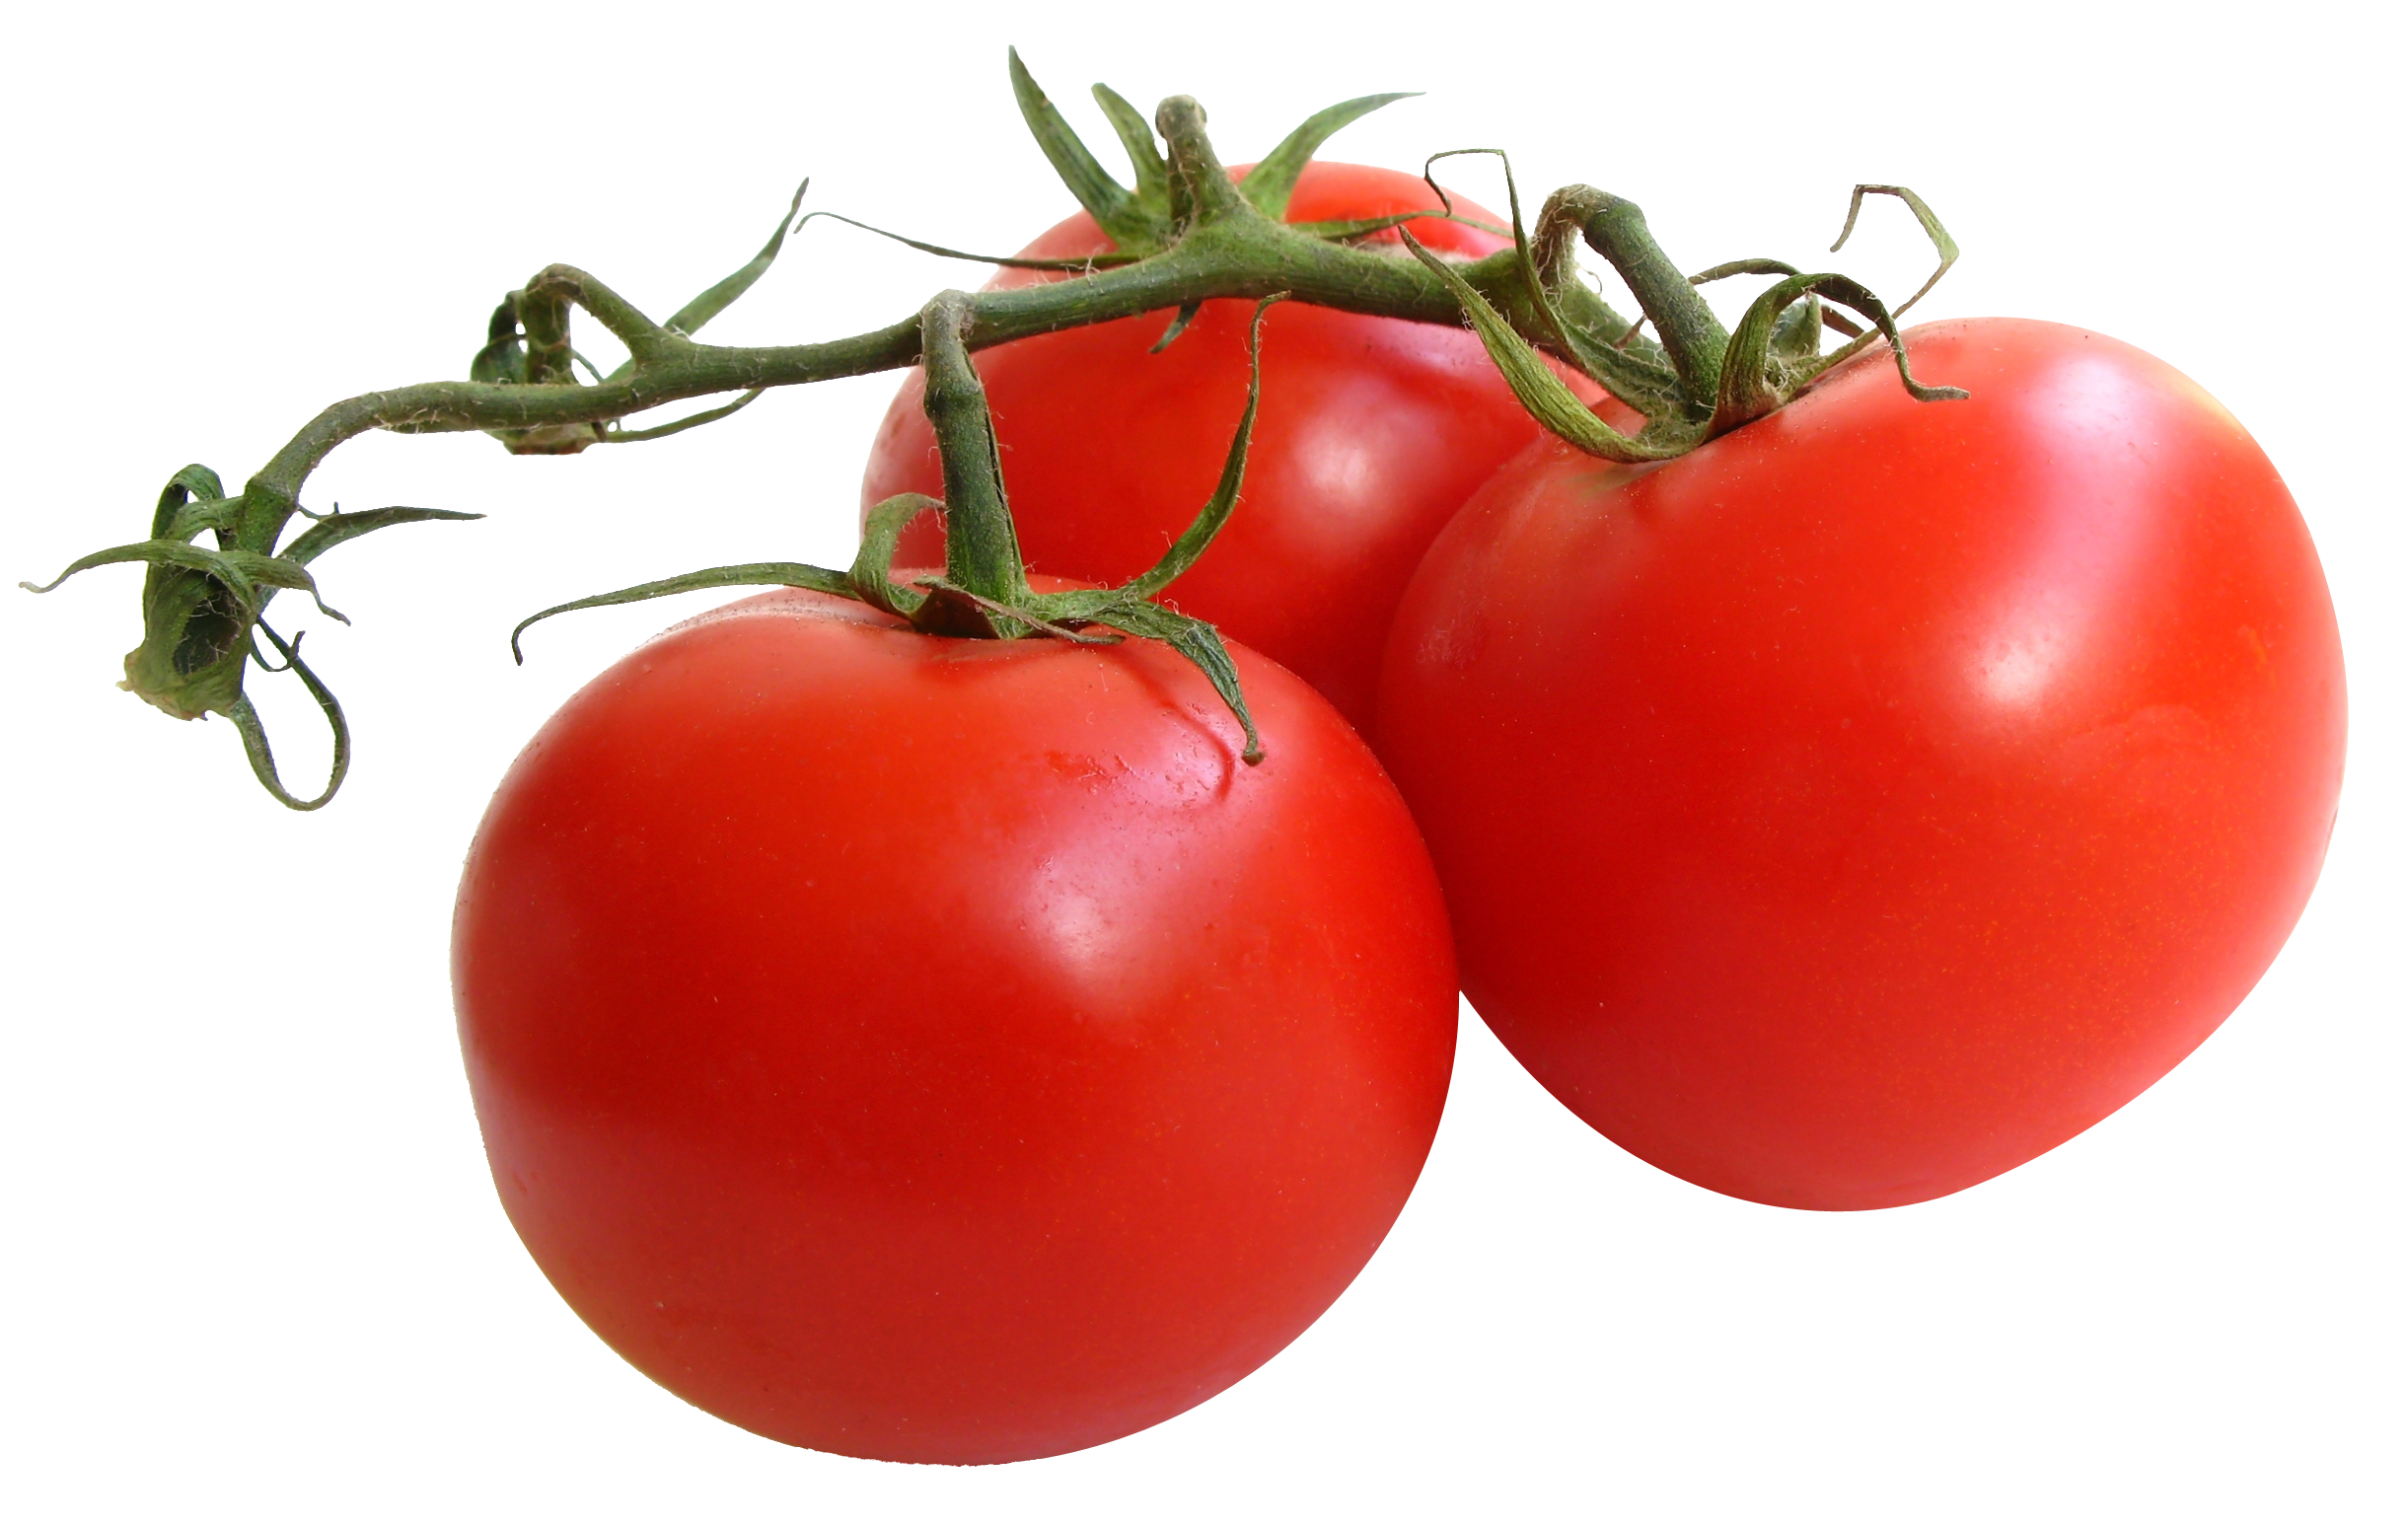 картинки овощей на прозрачном фоне